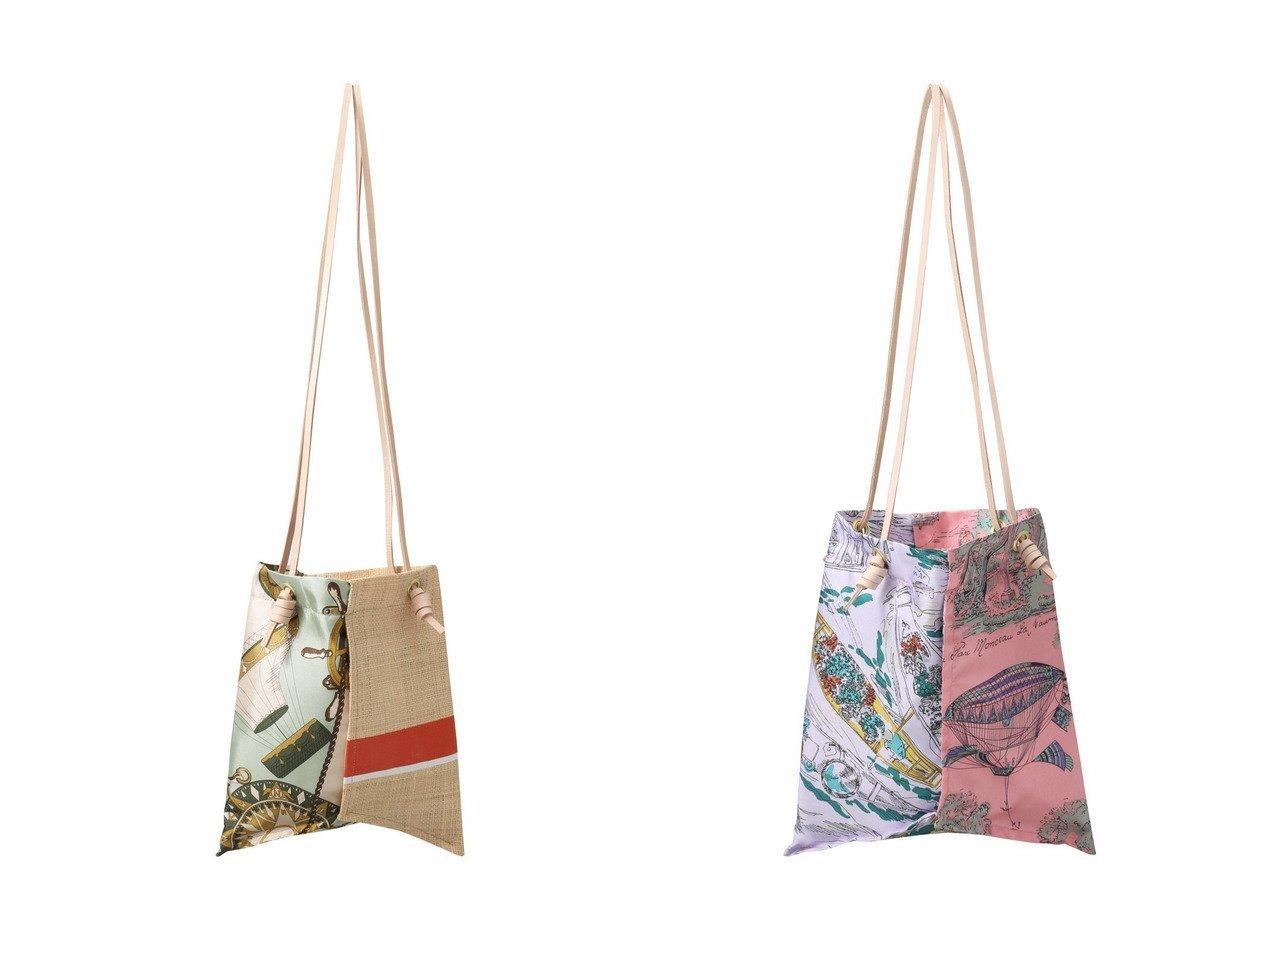 【manipuri/マニプリ】のスカーフトートバッグ S&スカーフトートバッグ S 【バッグ・鞄】おすすめ!人気、トレンド・レディースファッションの通販 おすすめで人気の流行・トレンド、ファッションの通販商品 メンズファッション・キッズファッション・インテリア・家具・レディースファッション・服の通販 founy(ファニー) https://founy.com/ ファッション Fashion レディースファッション WOMEN バッグ Bag S/S・春夏 SS・Spring/Summer スカーフ ドッキング ハンドバッグ フォルム プリント ラフィア 春 Spring  ID:crp329100000030205